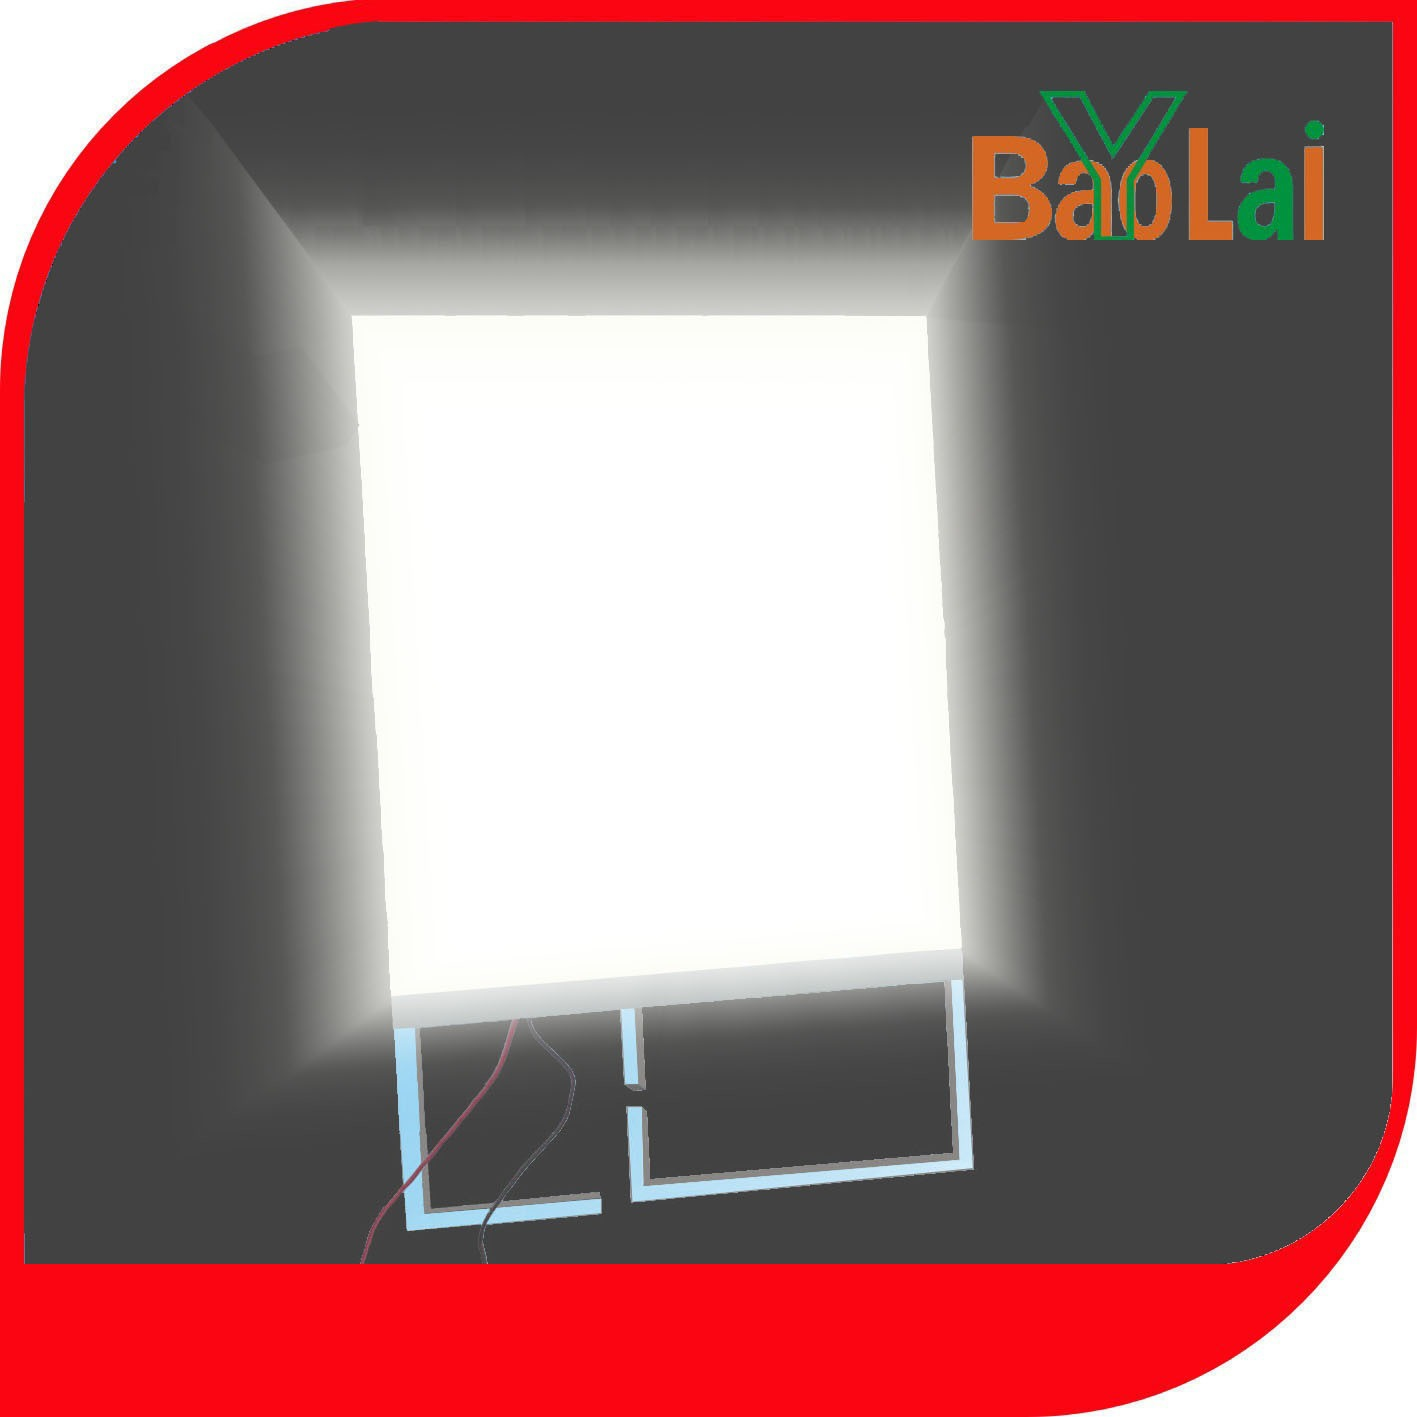 lcd背光源导光板厂家定制 家用电器仪器仪表LED背光源透镜侧背光